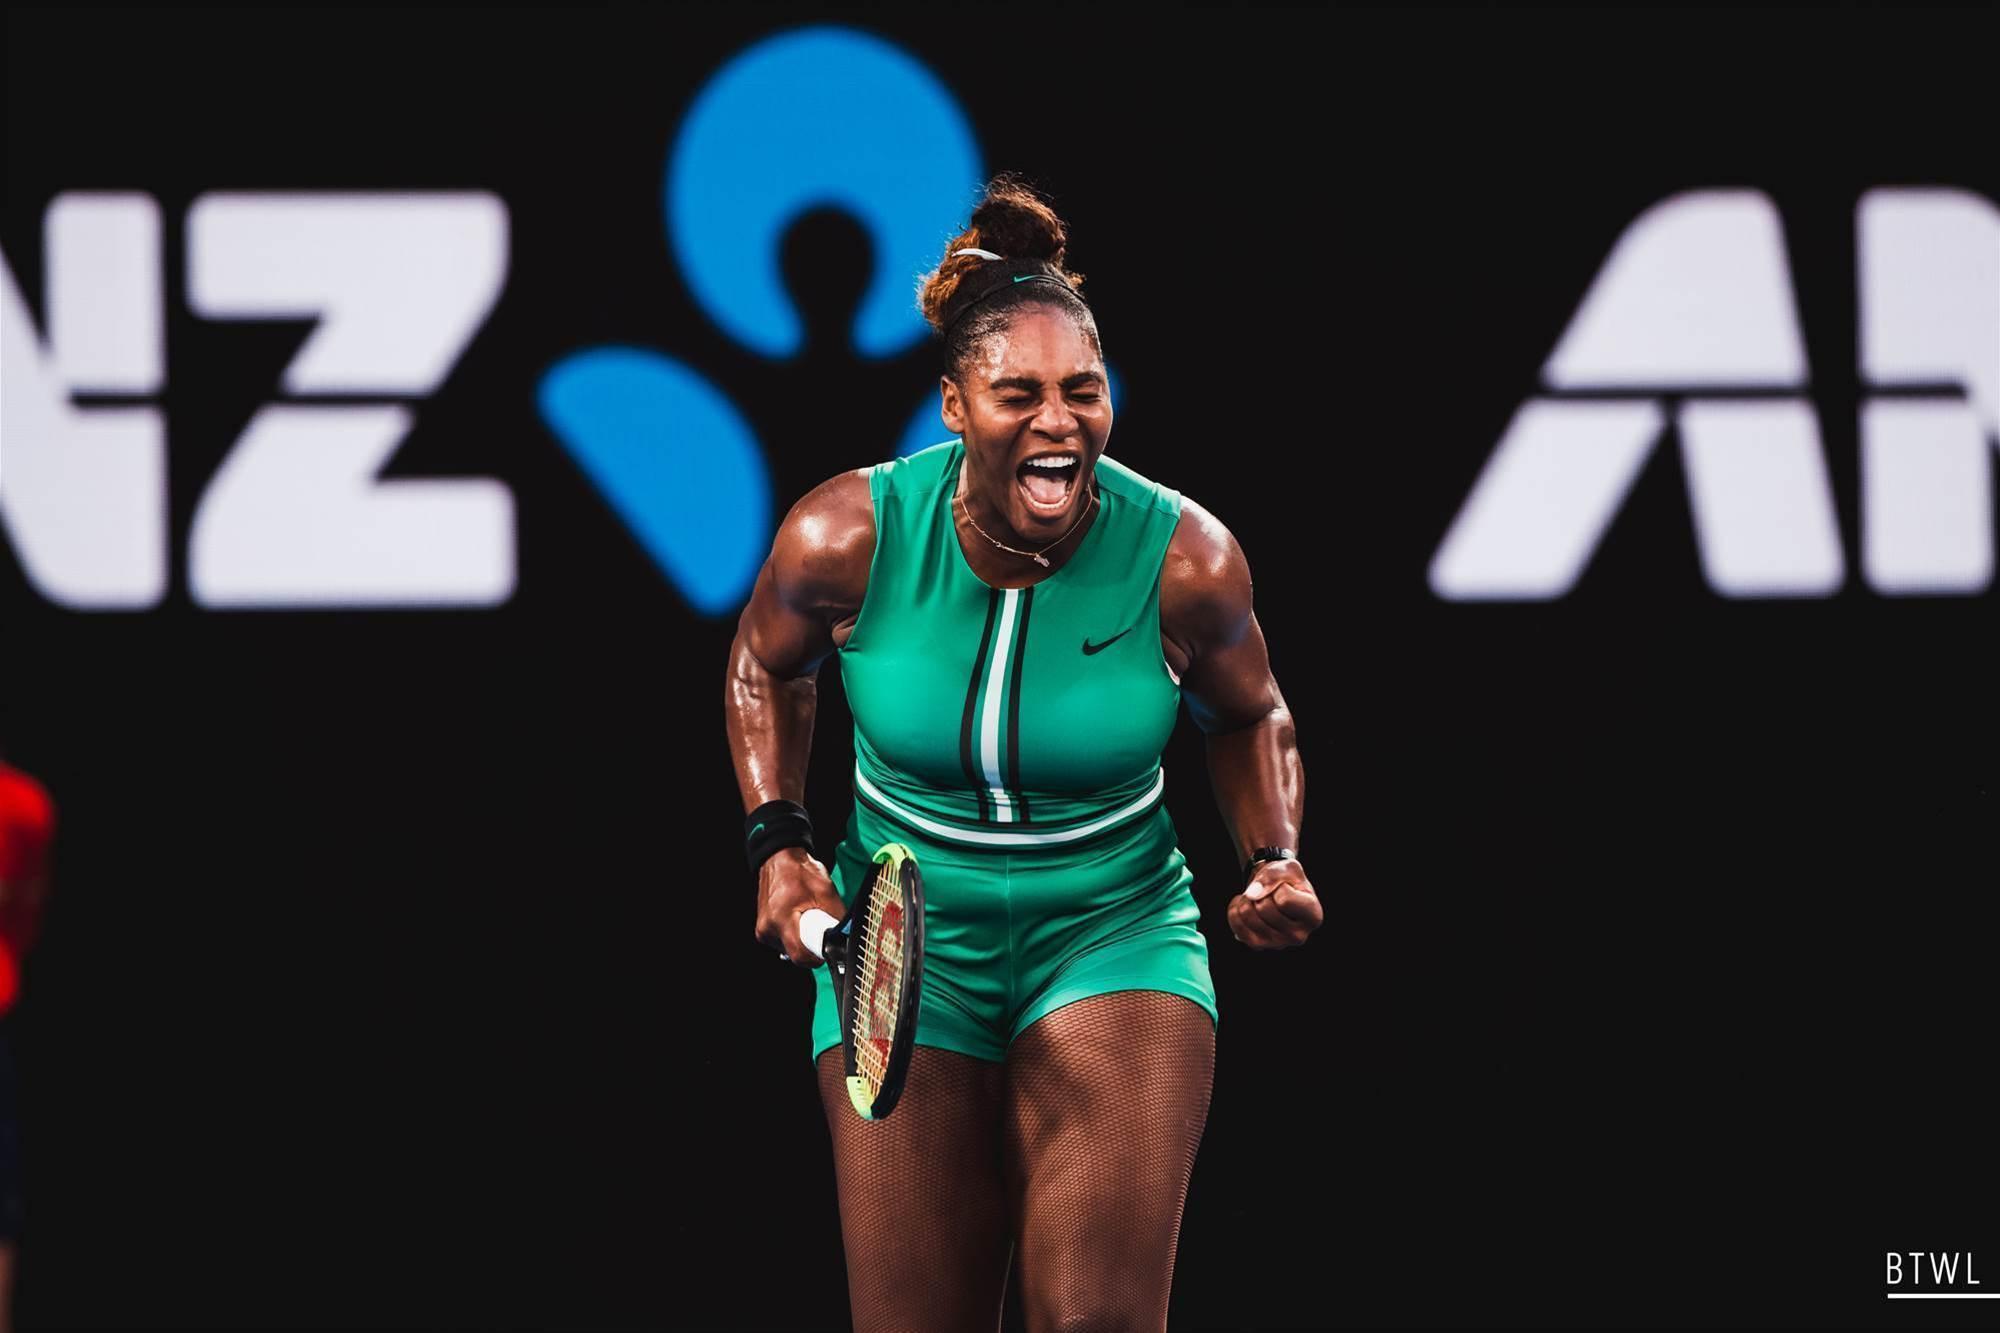 Pic special: Serena Williams vs Simona Halep